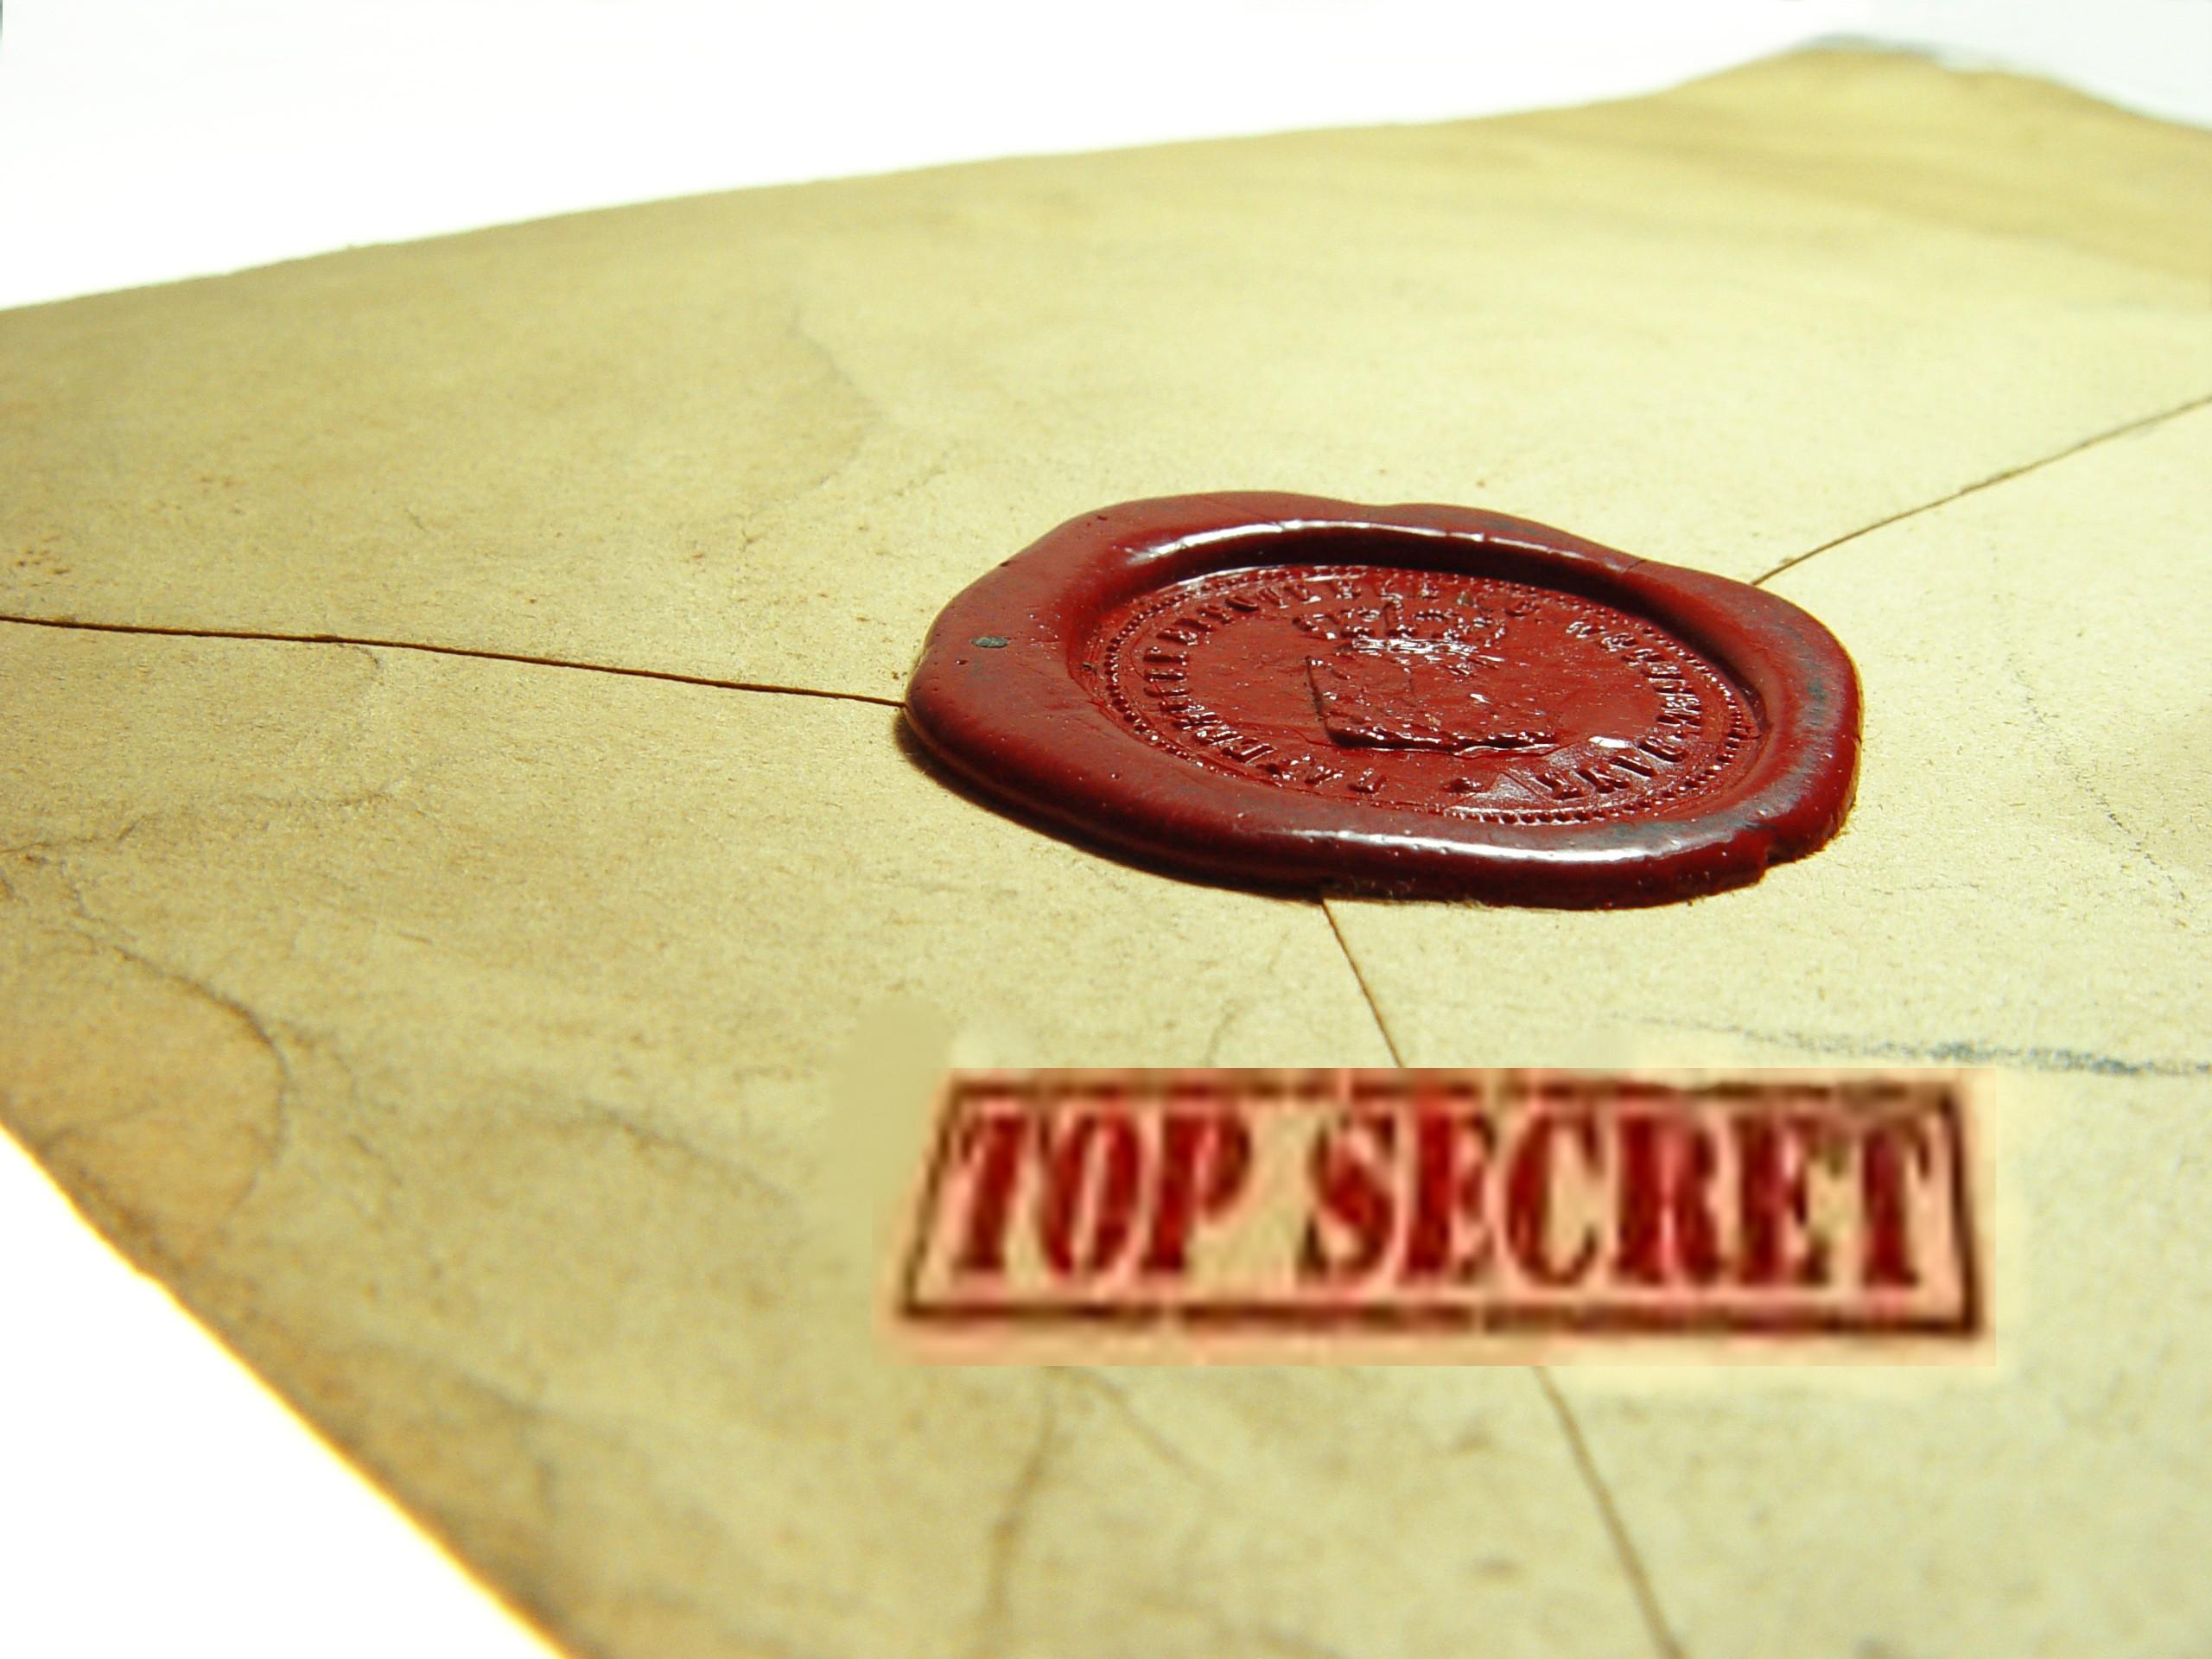 secret dates website